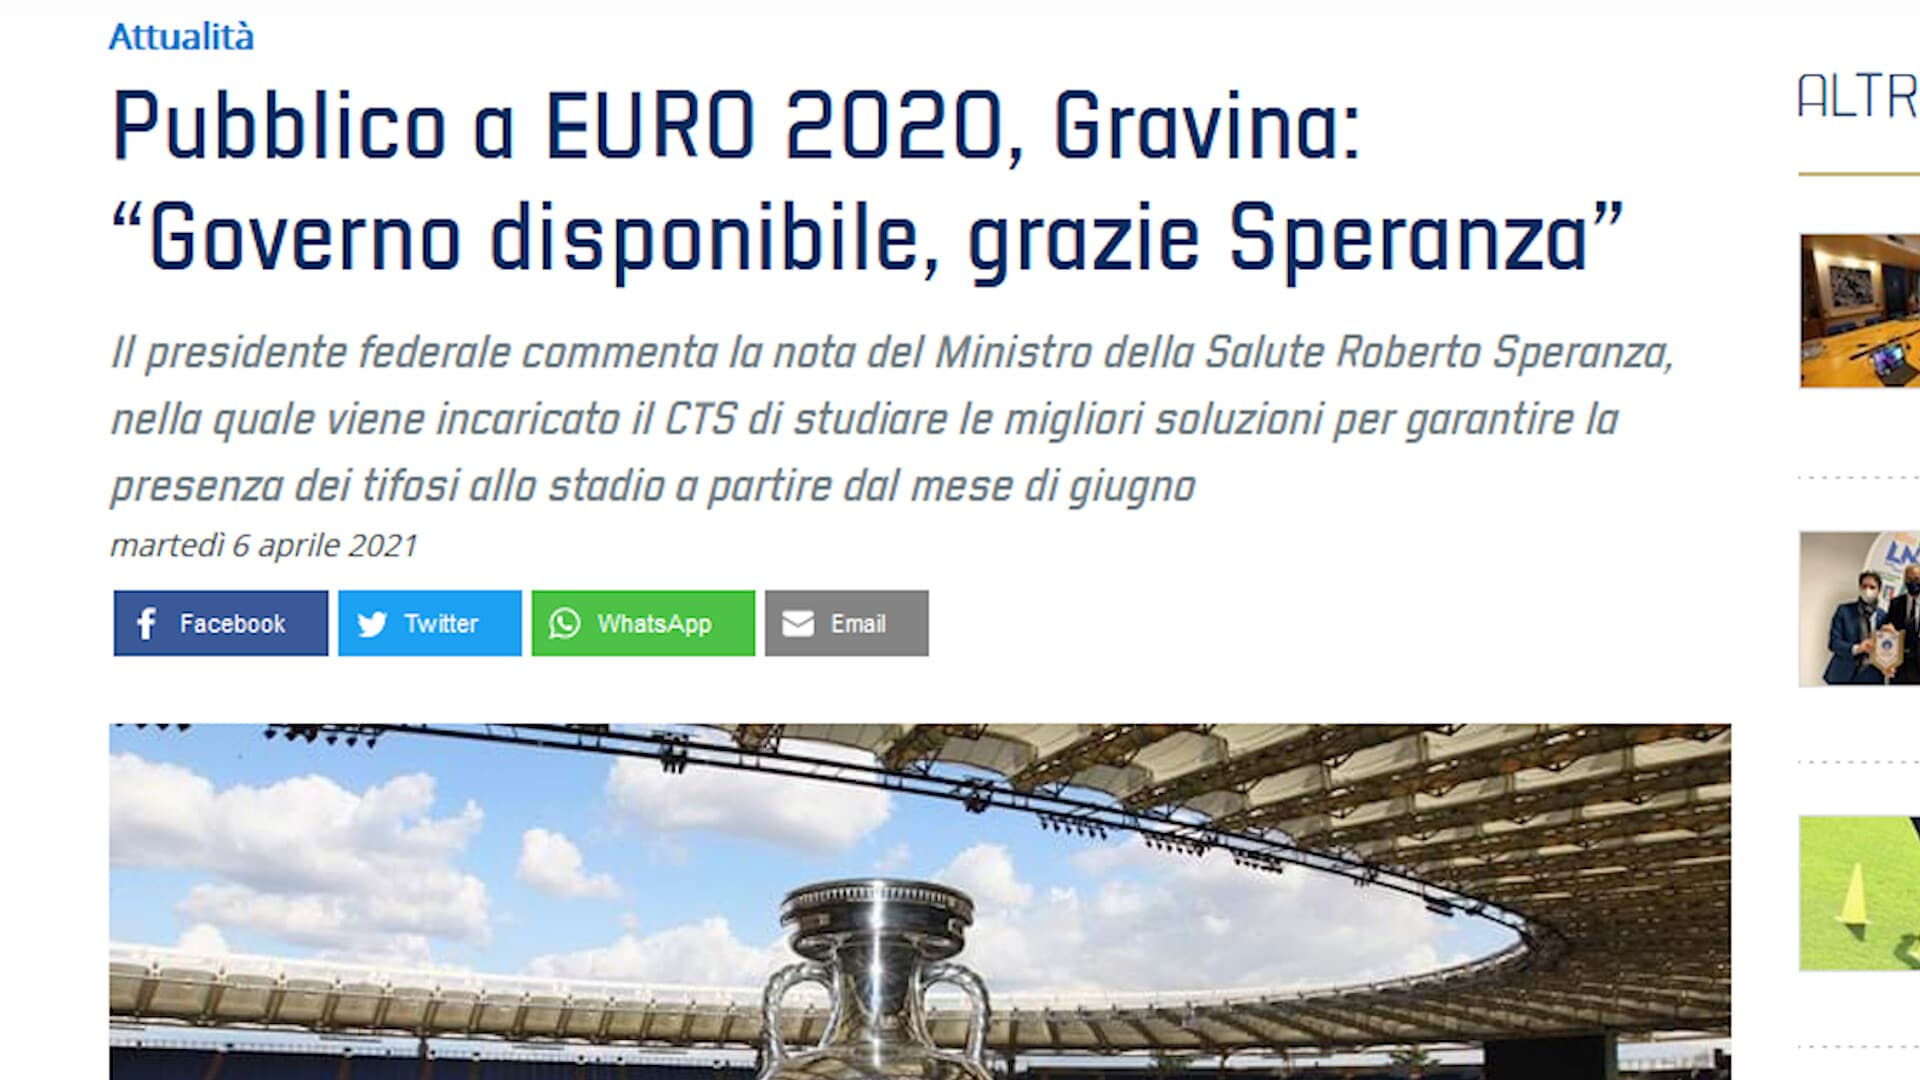 Italia, via libera dal Governo: Europei con tifosi allo stadio